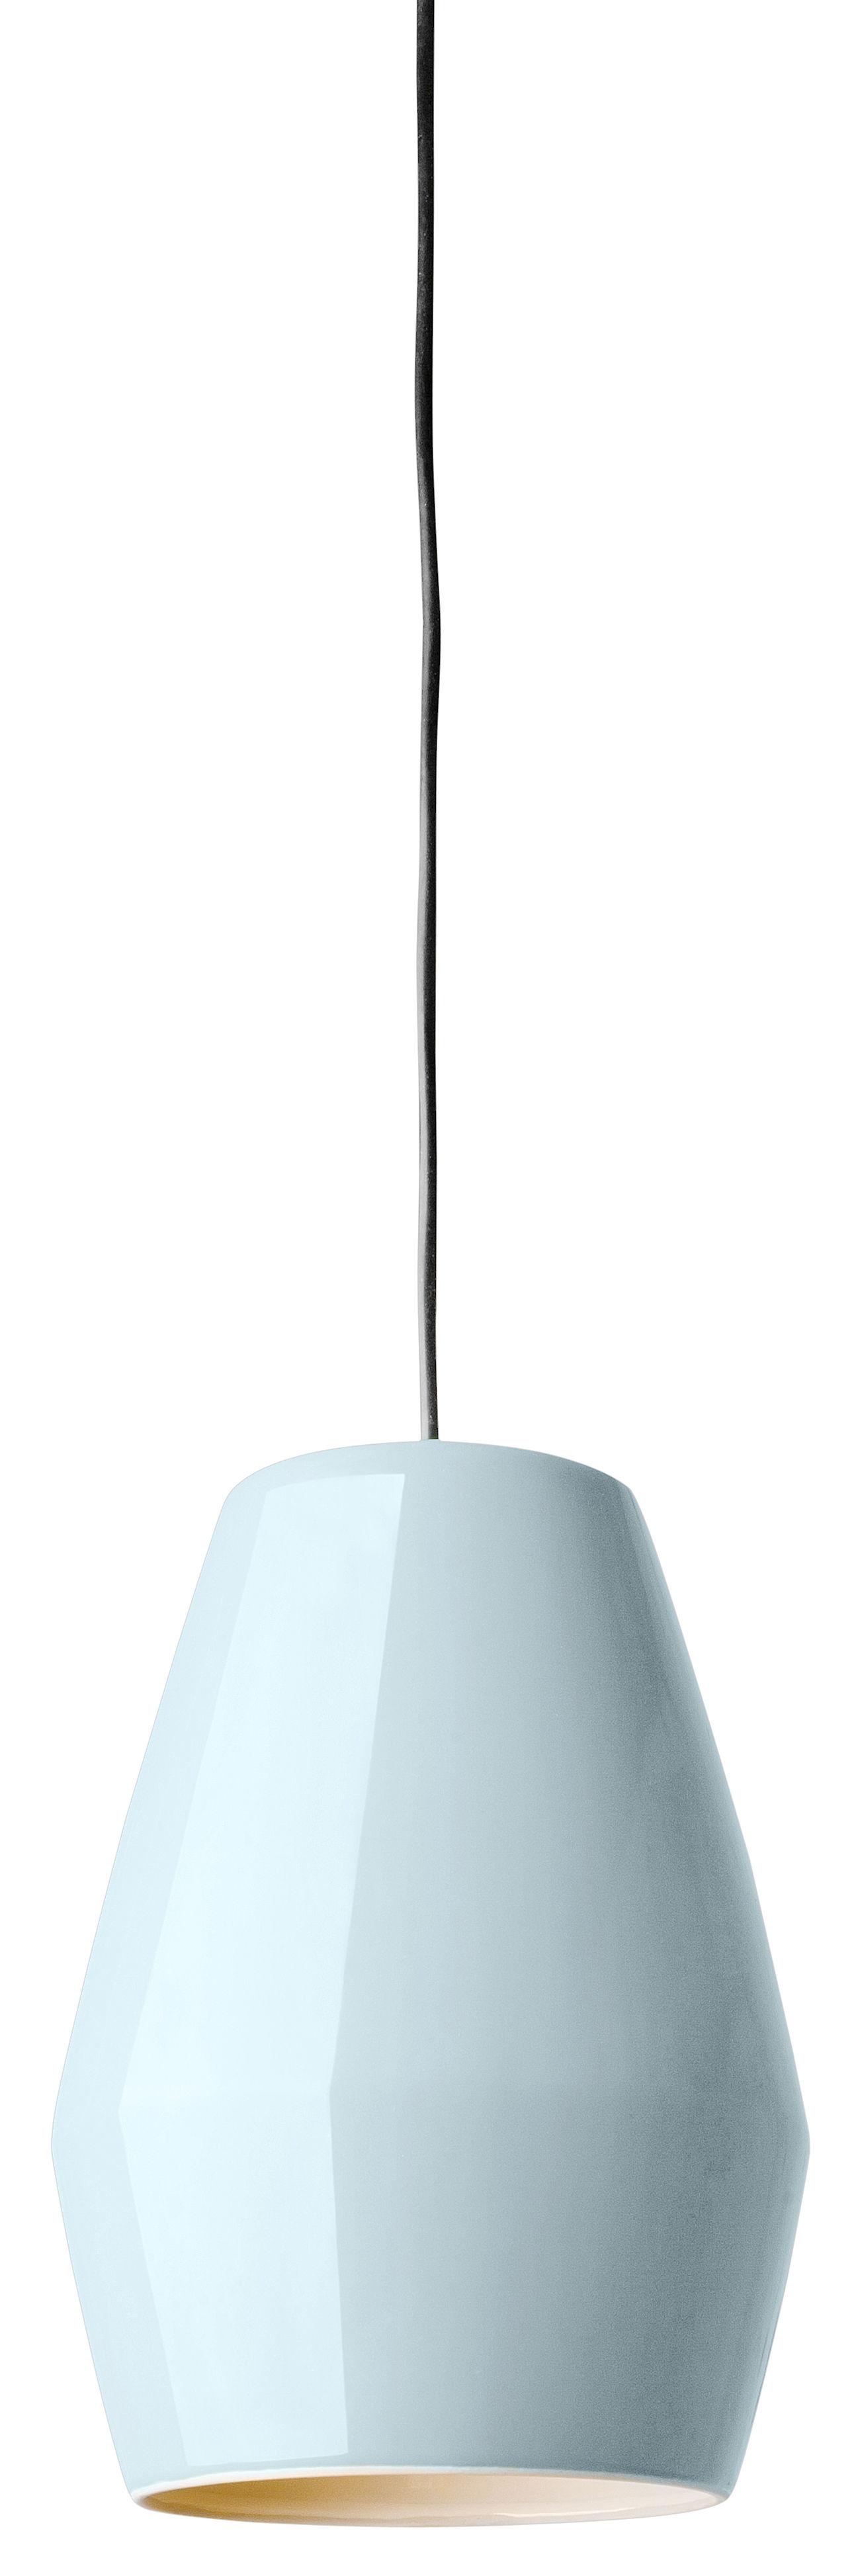 Illuminazione - Lampadari - Sospensione Bell - in porcellana di Northern  - Blu chiaro - Porcellana